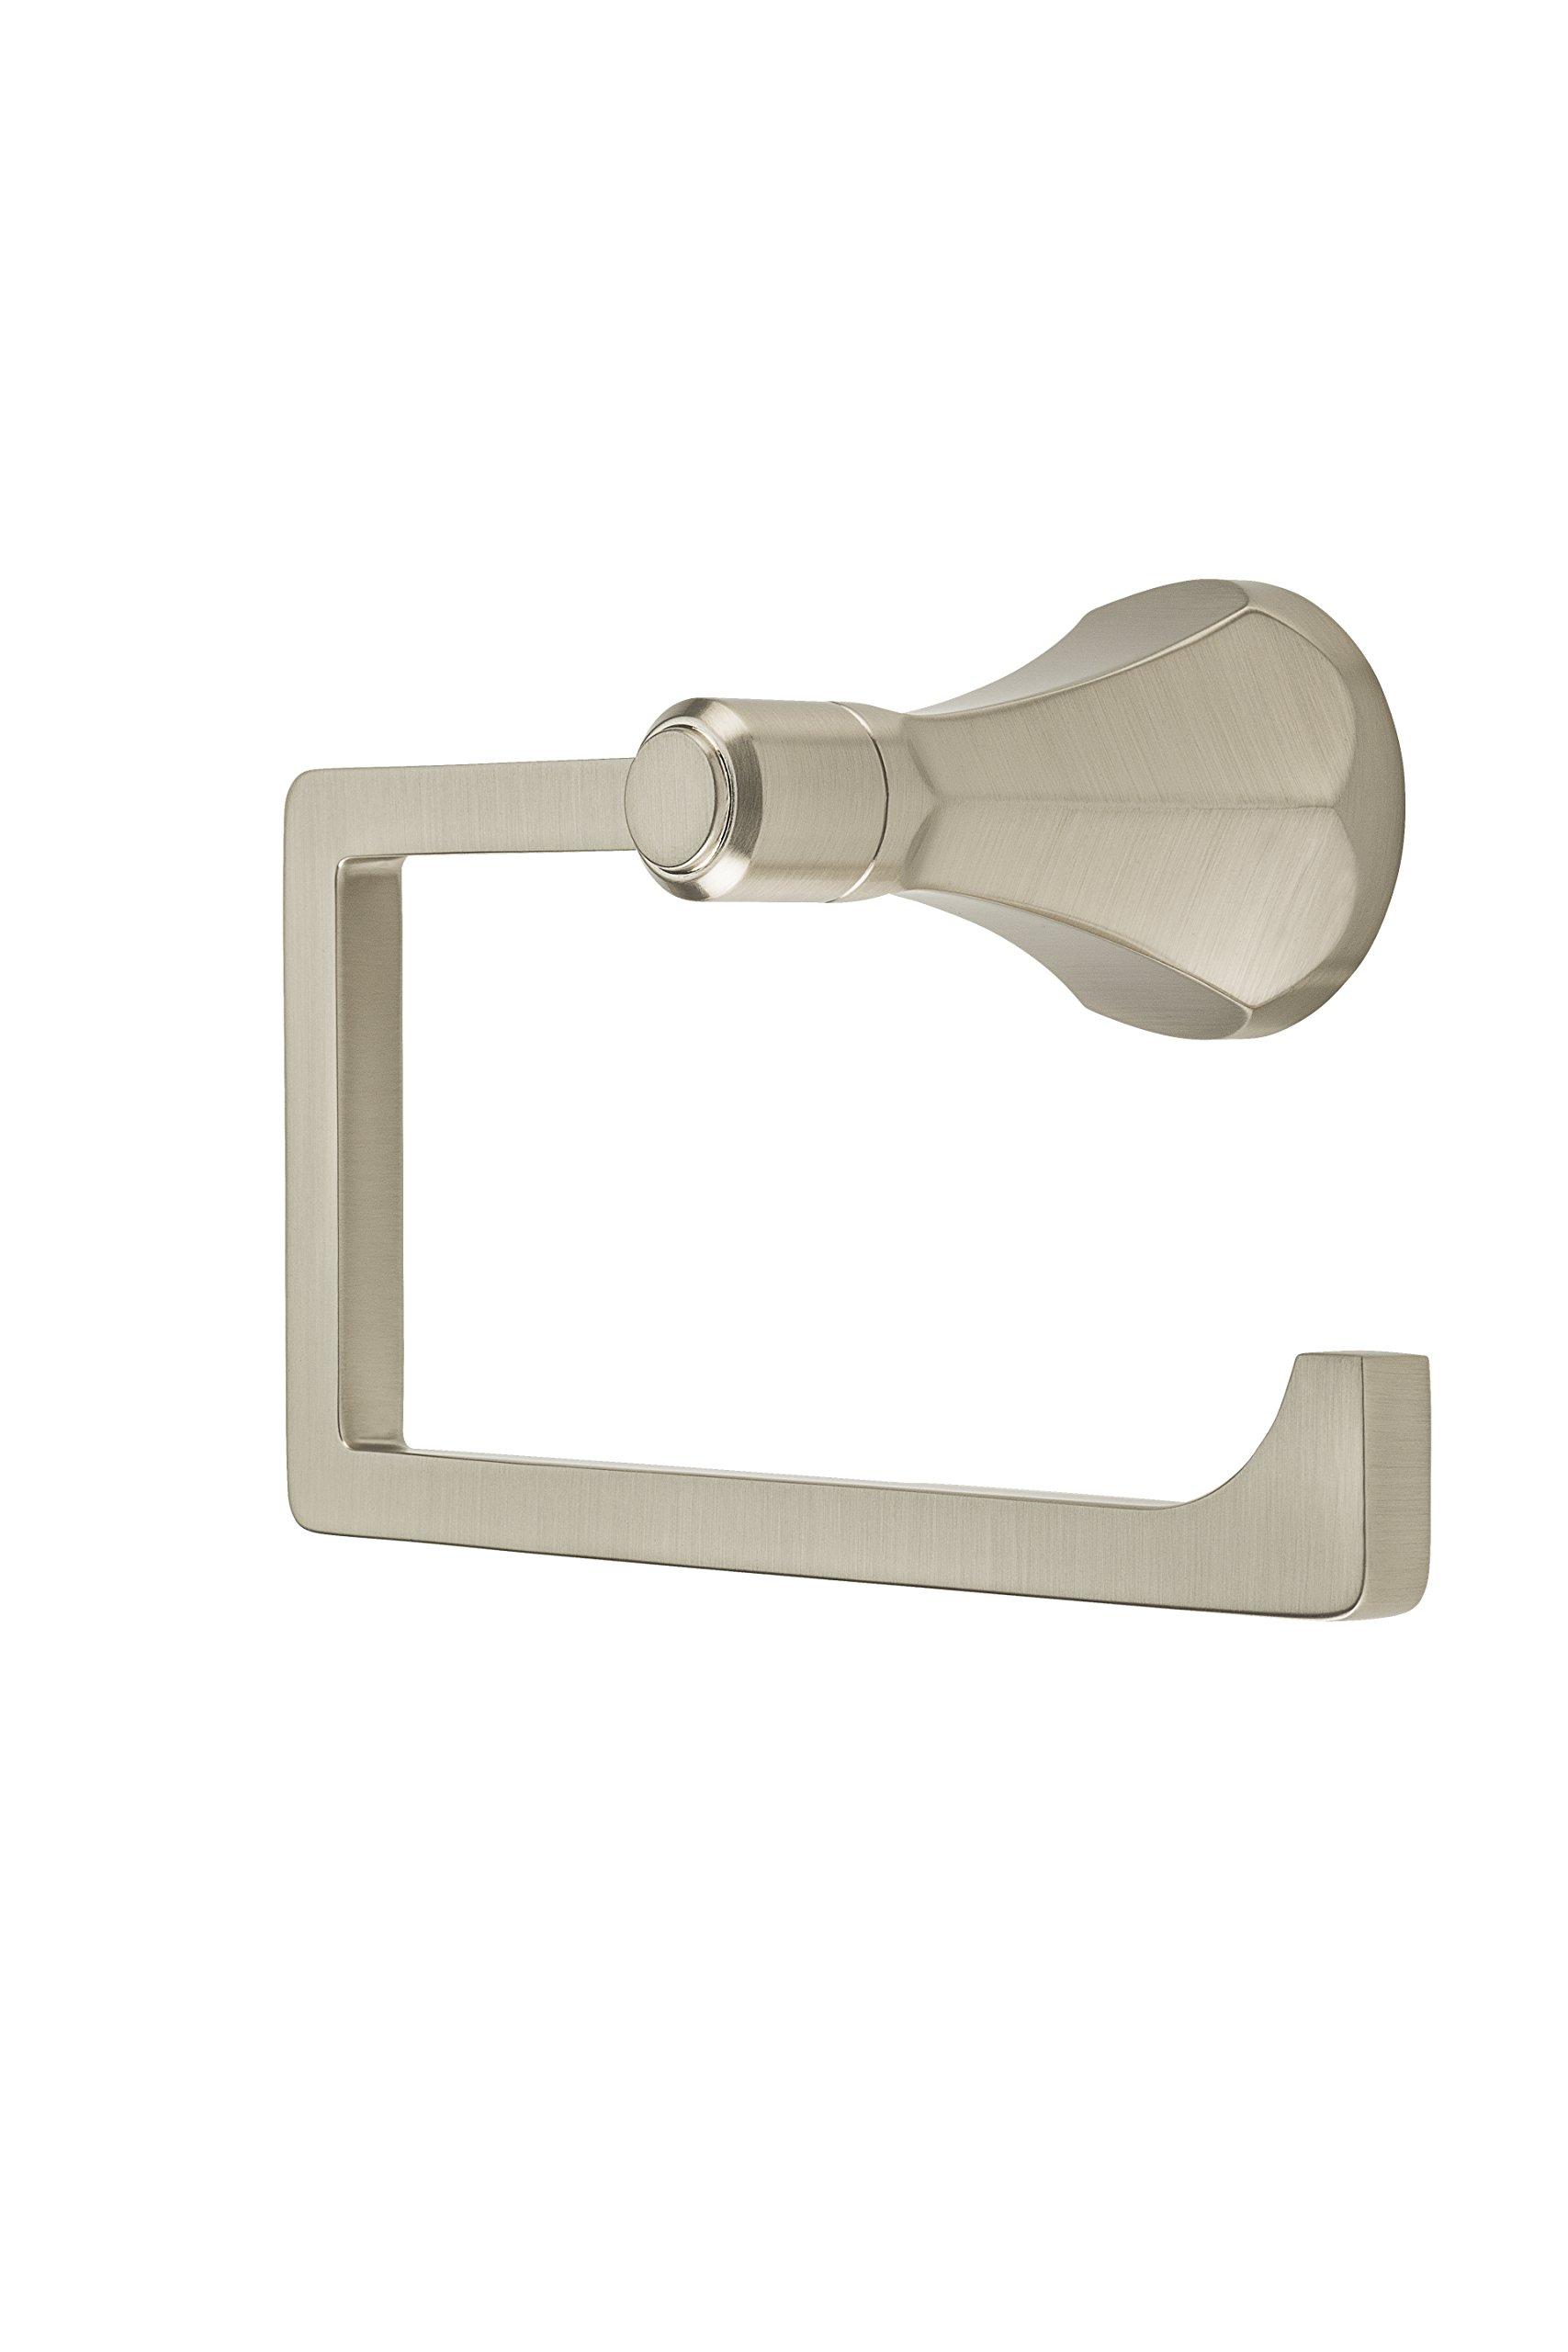 Pfister Arterra Towel Ring, Brushed Nickel